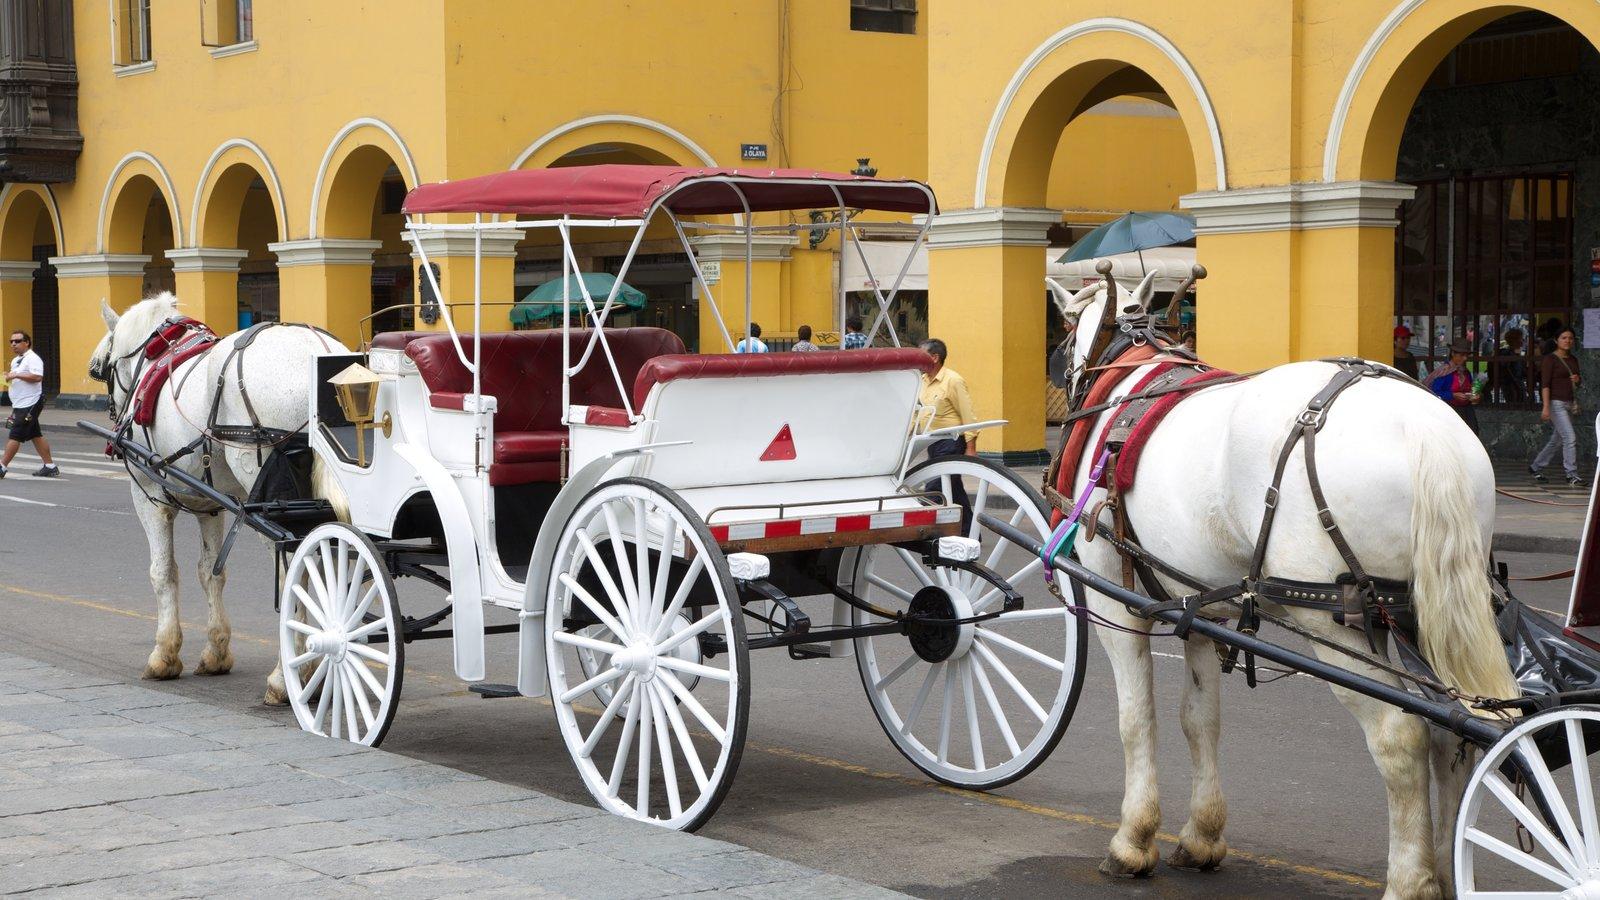 Plaza mayor montrant ville, scènes de rue et animaux terrestres